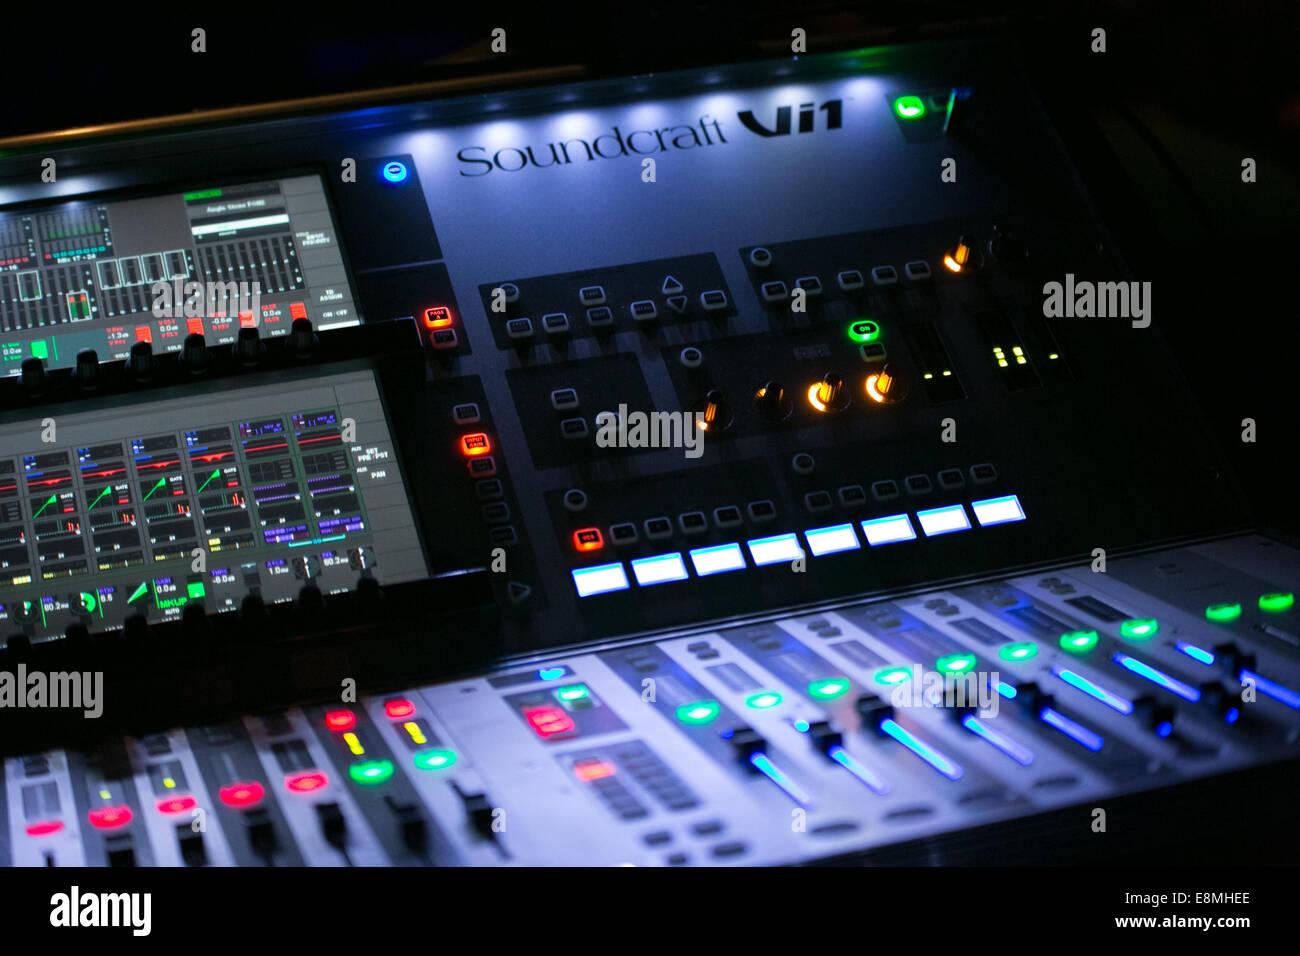 DJ Mixing Sound Engineer Decks in a nightclub - Stock Image